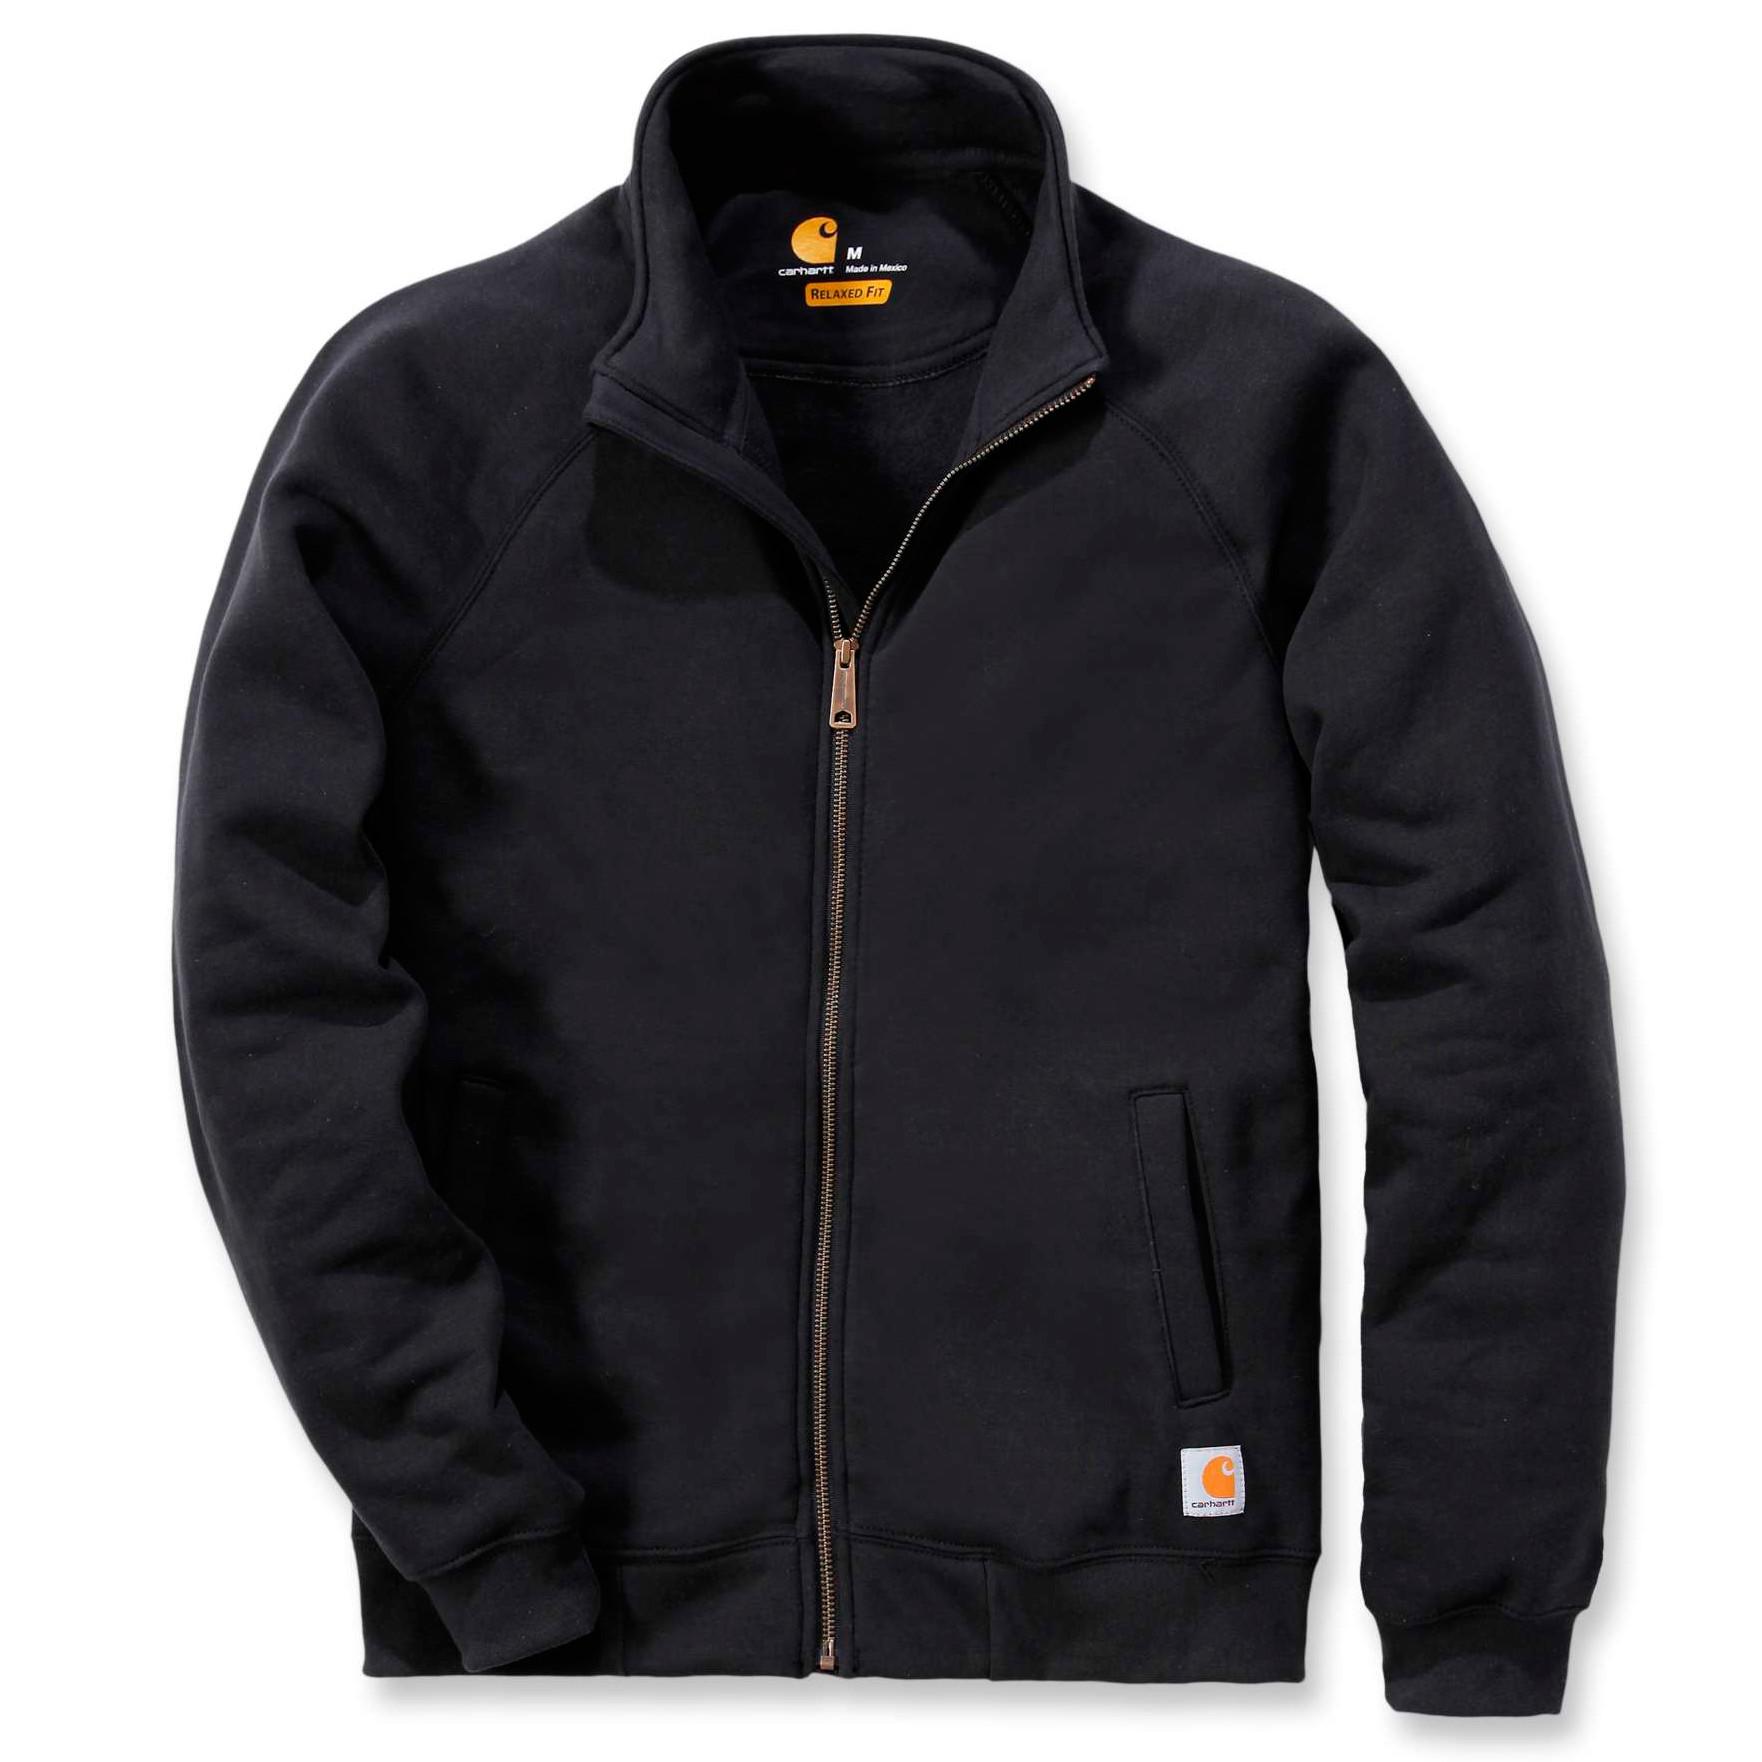 Свитшот на молнии Carhartt Midweight Mock Neck Zip Sweatshirt - K350 (Black)